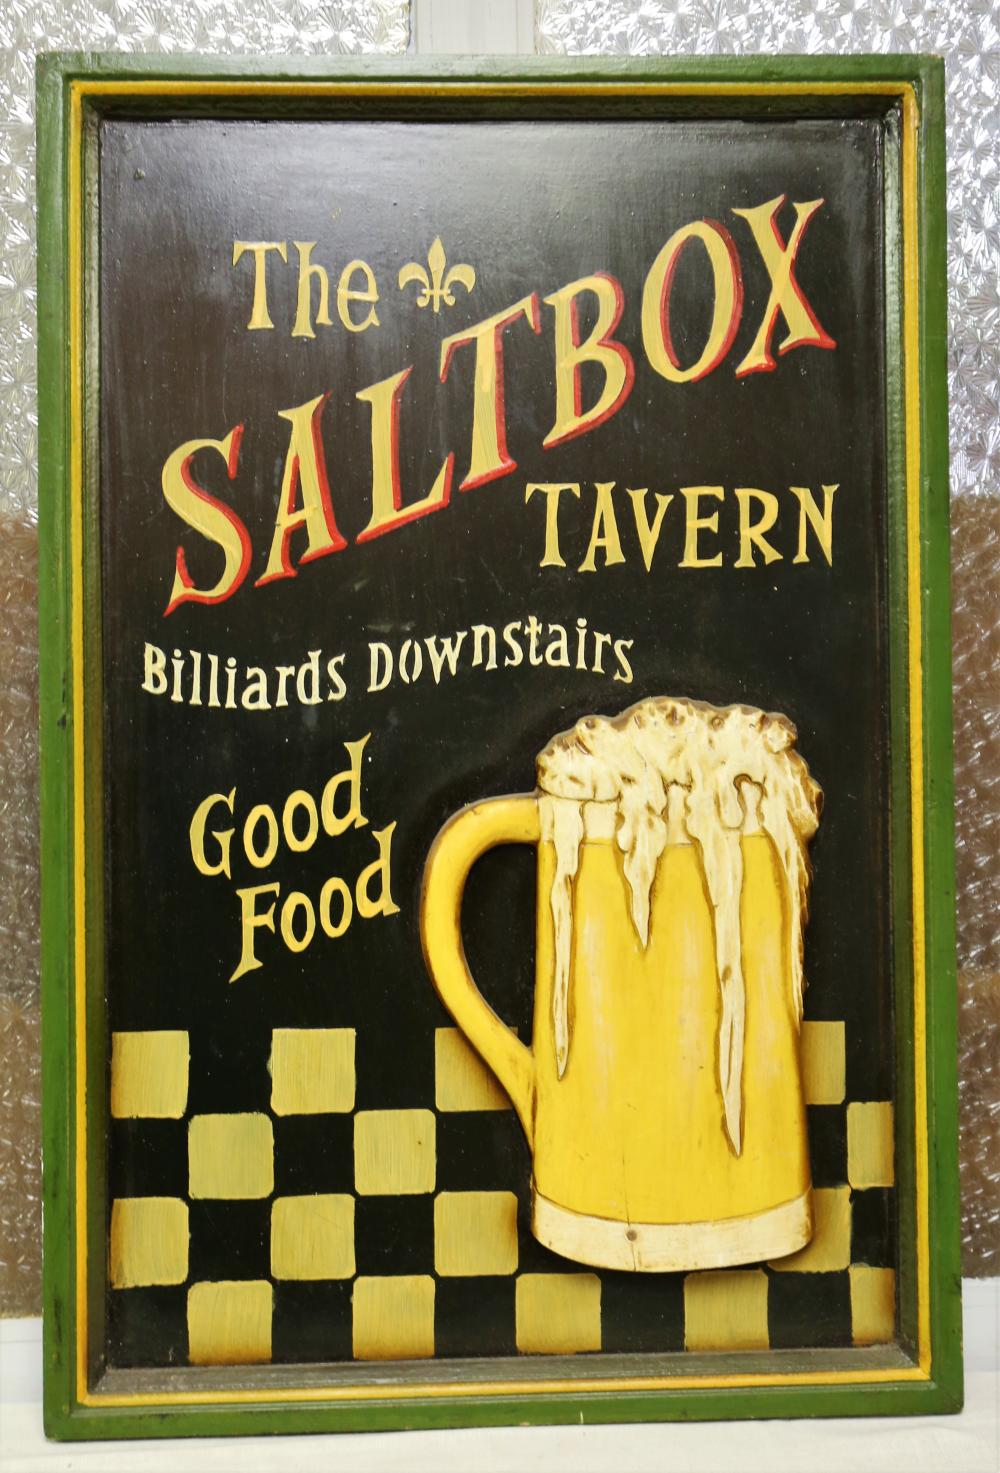 Saltbox tavern wooden sign